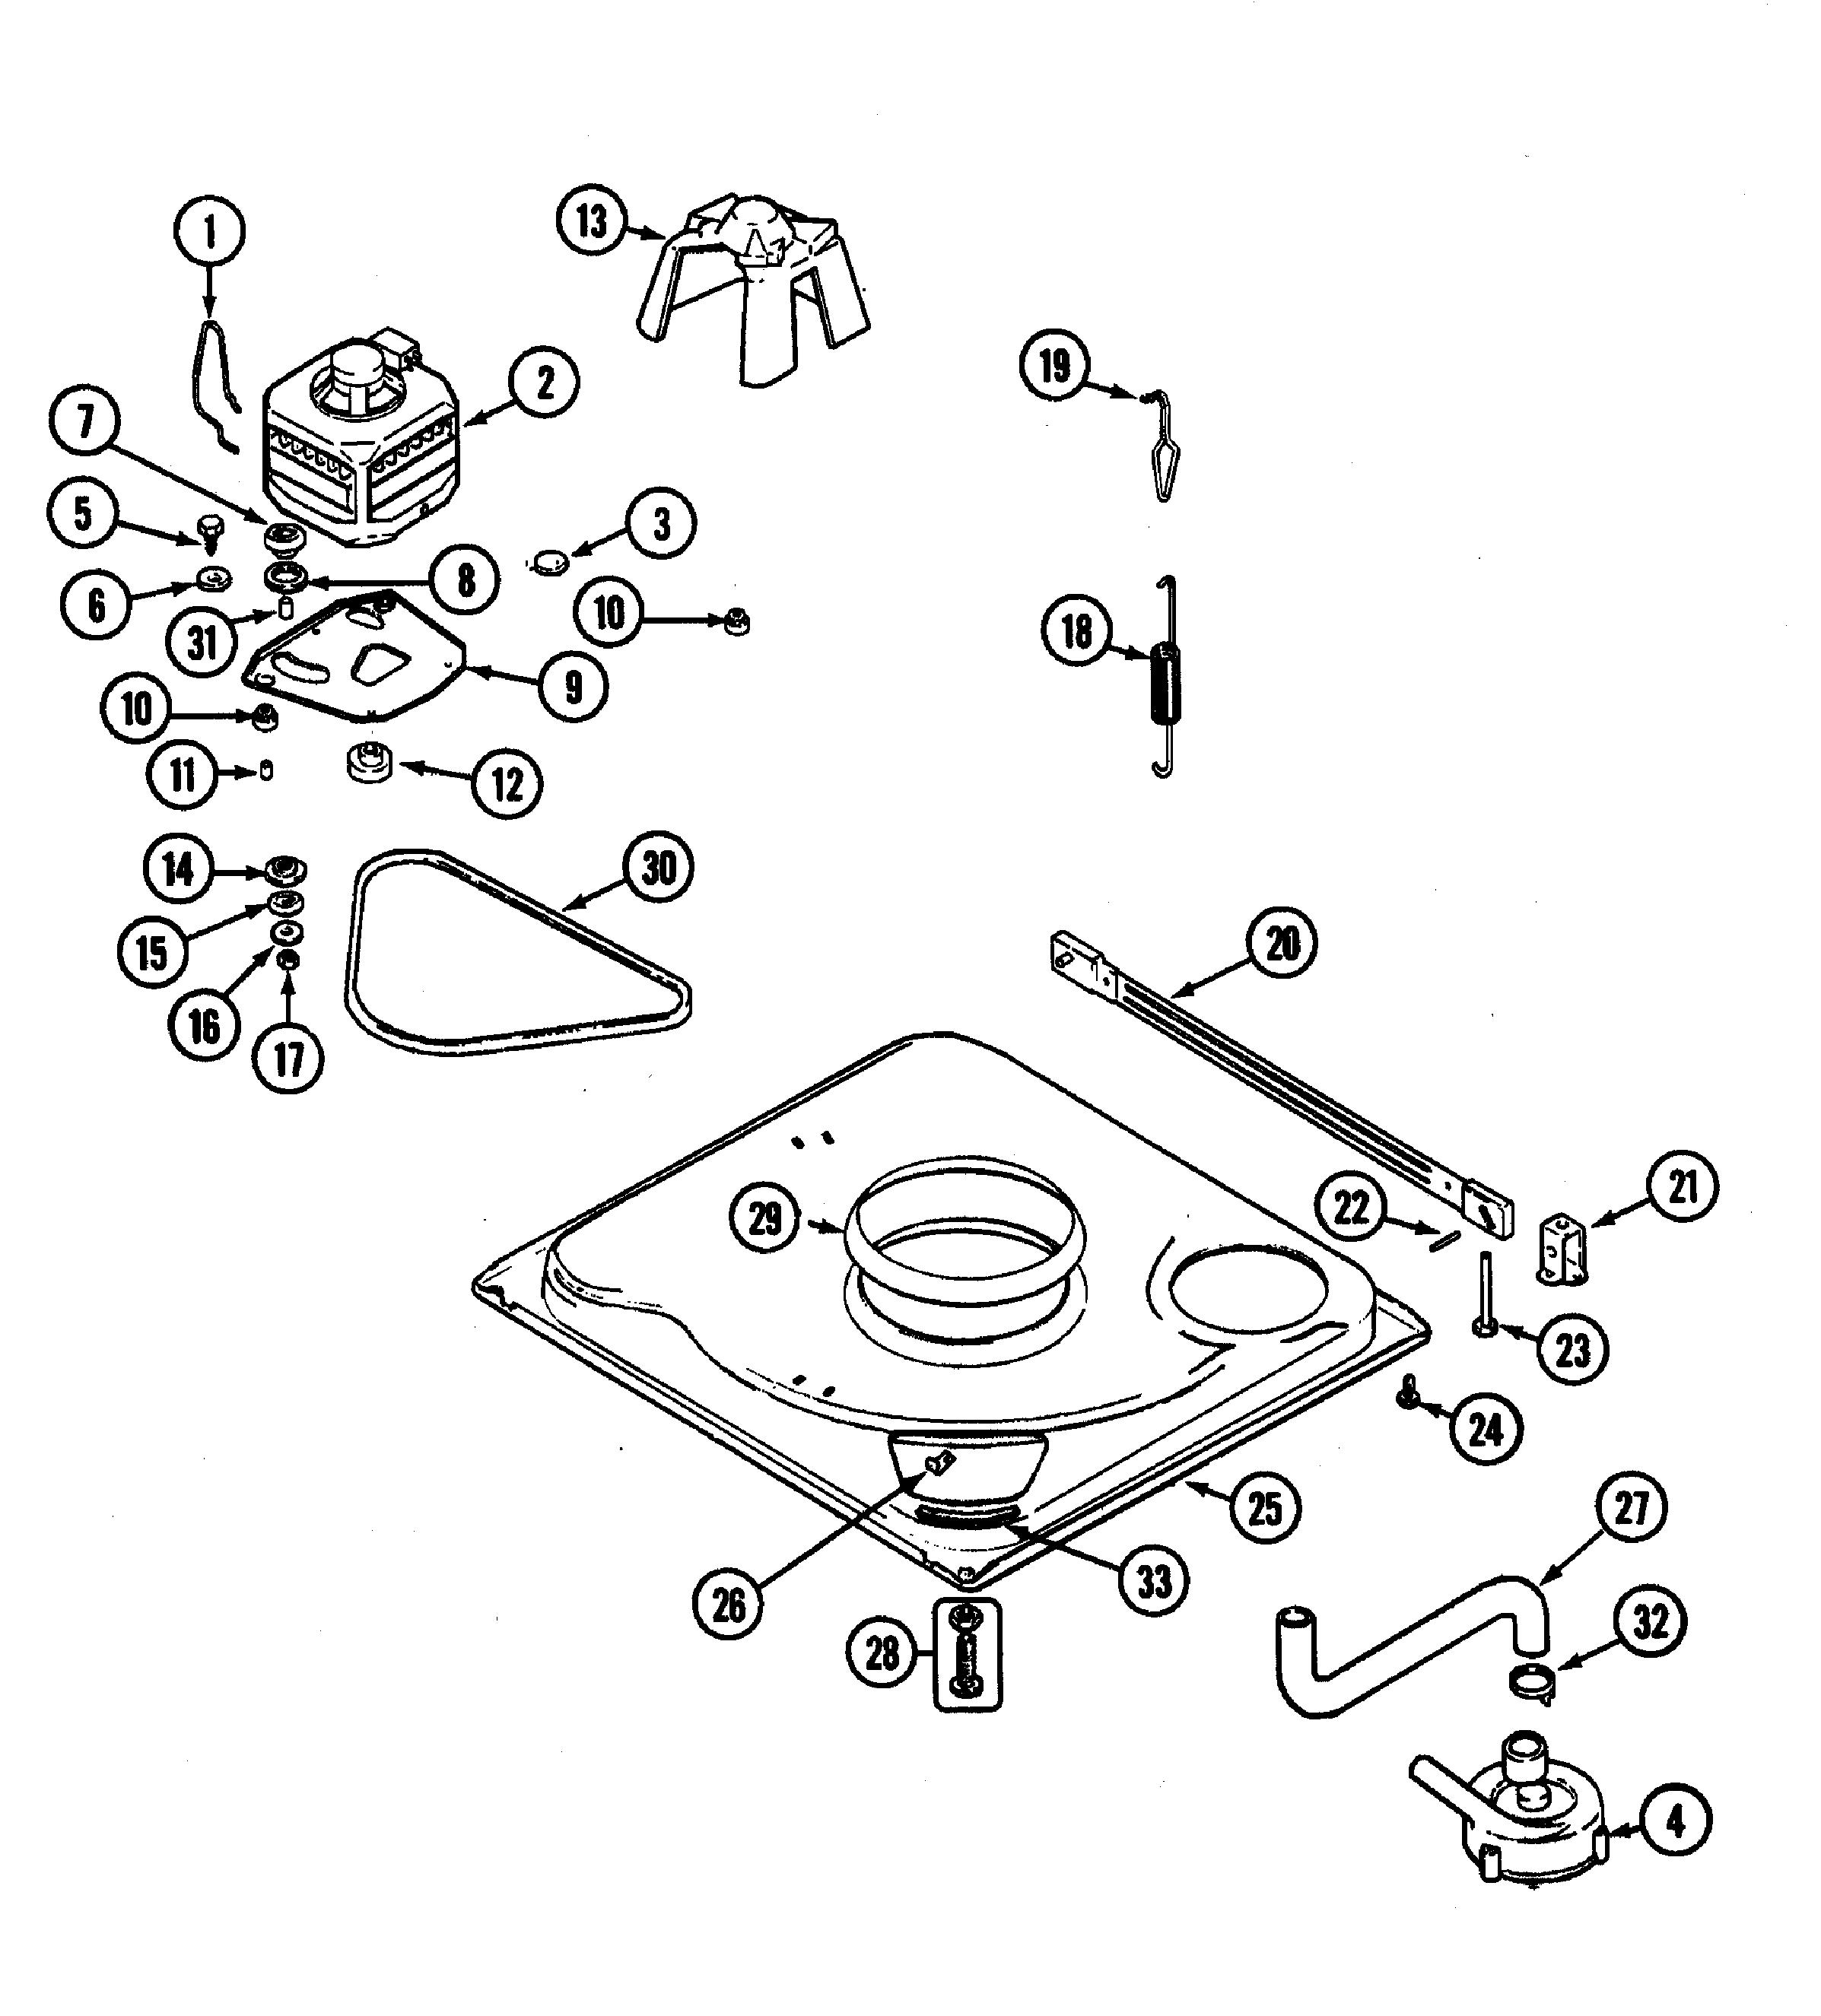 Maytag model PAV2300AWW residential washers genuine parts